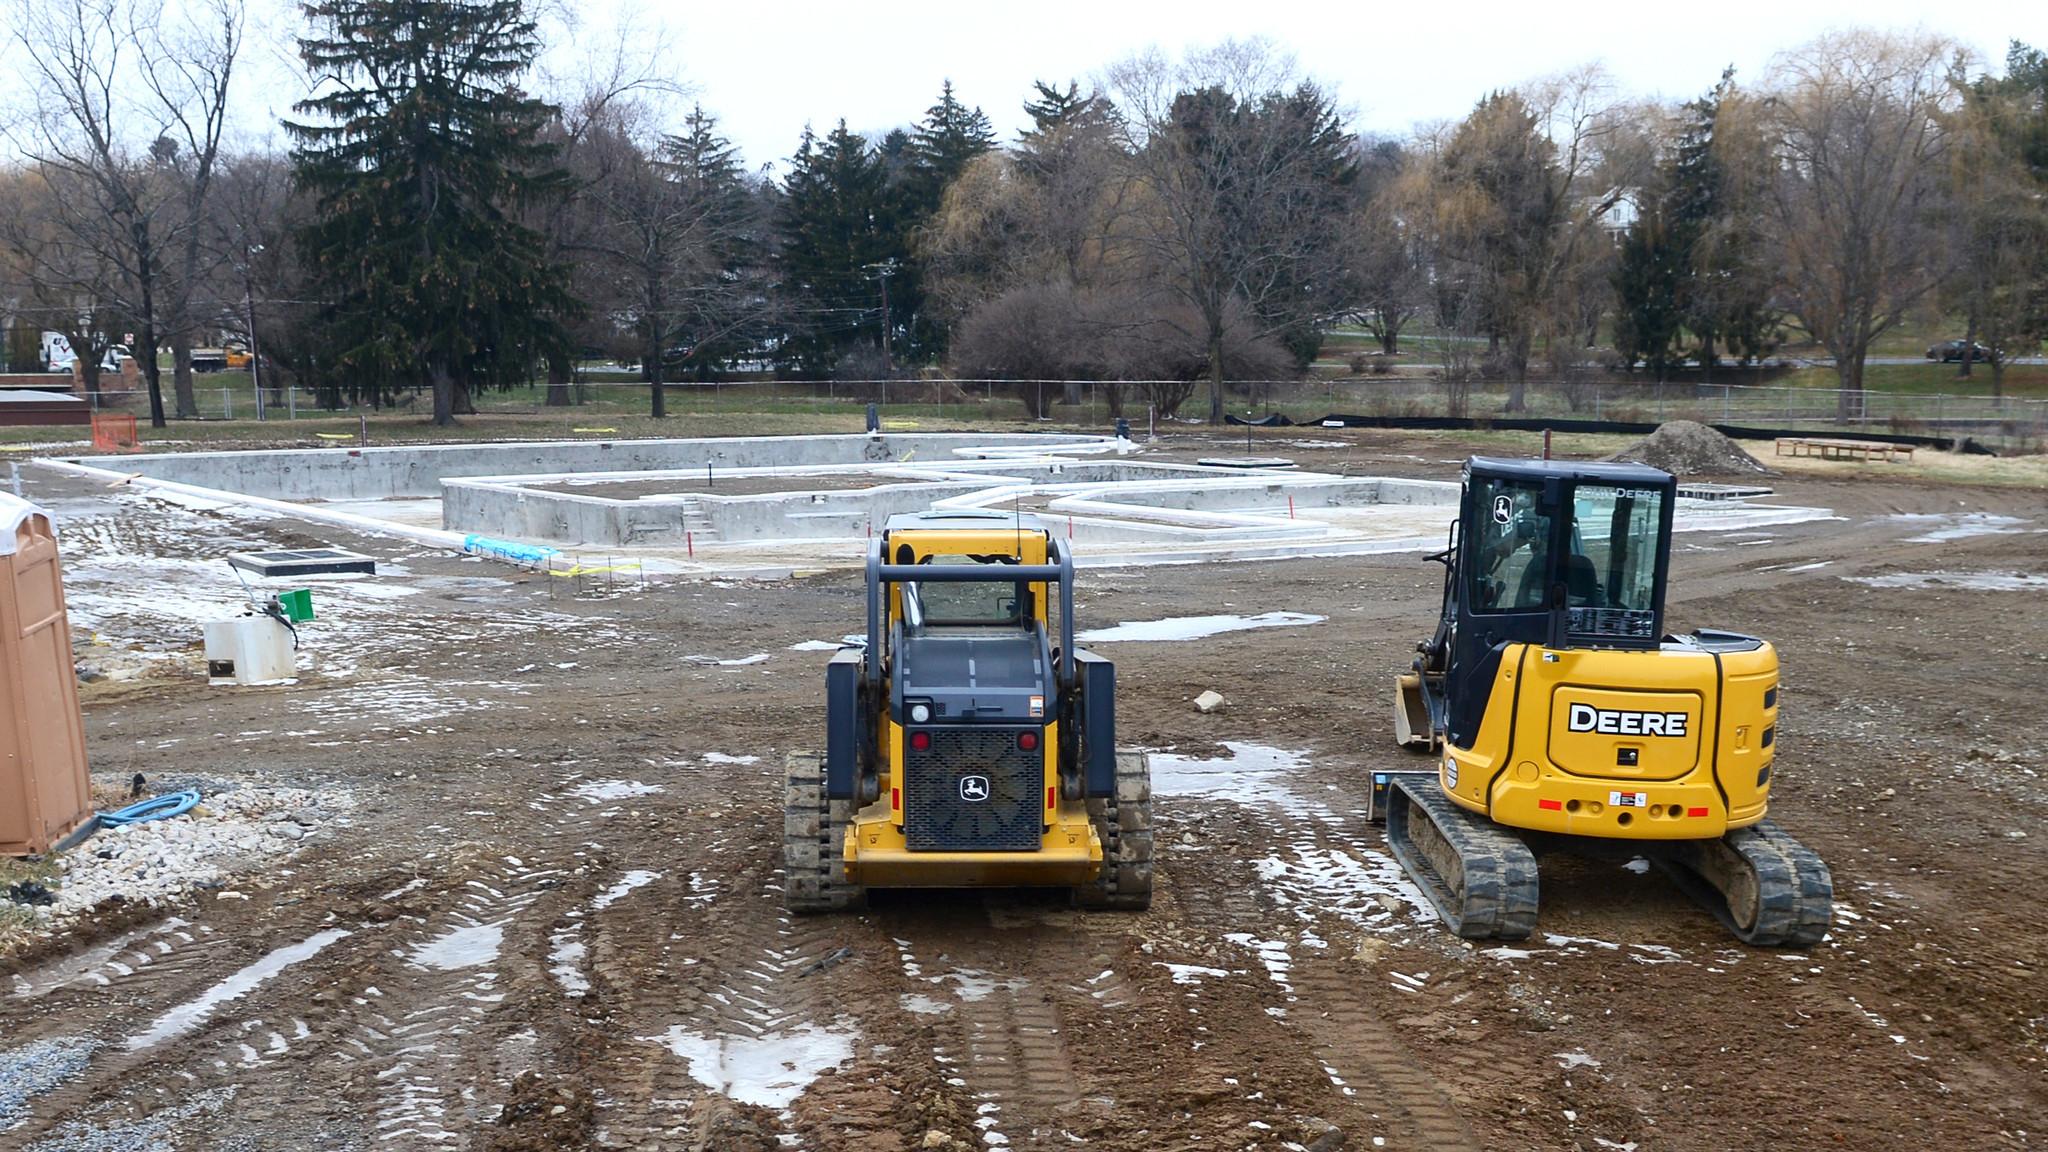 Grand jury dives into cedar beach pool project the - Cedar beach swimming pool allentown pa ...